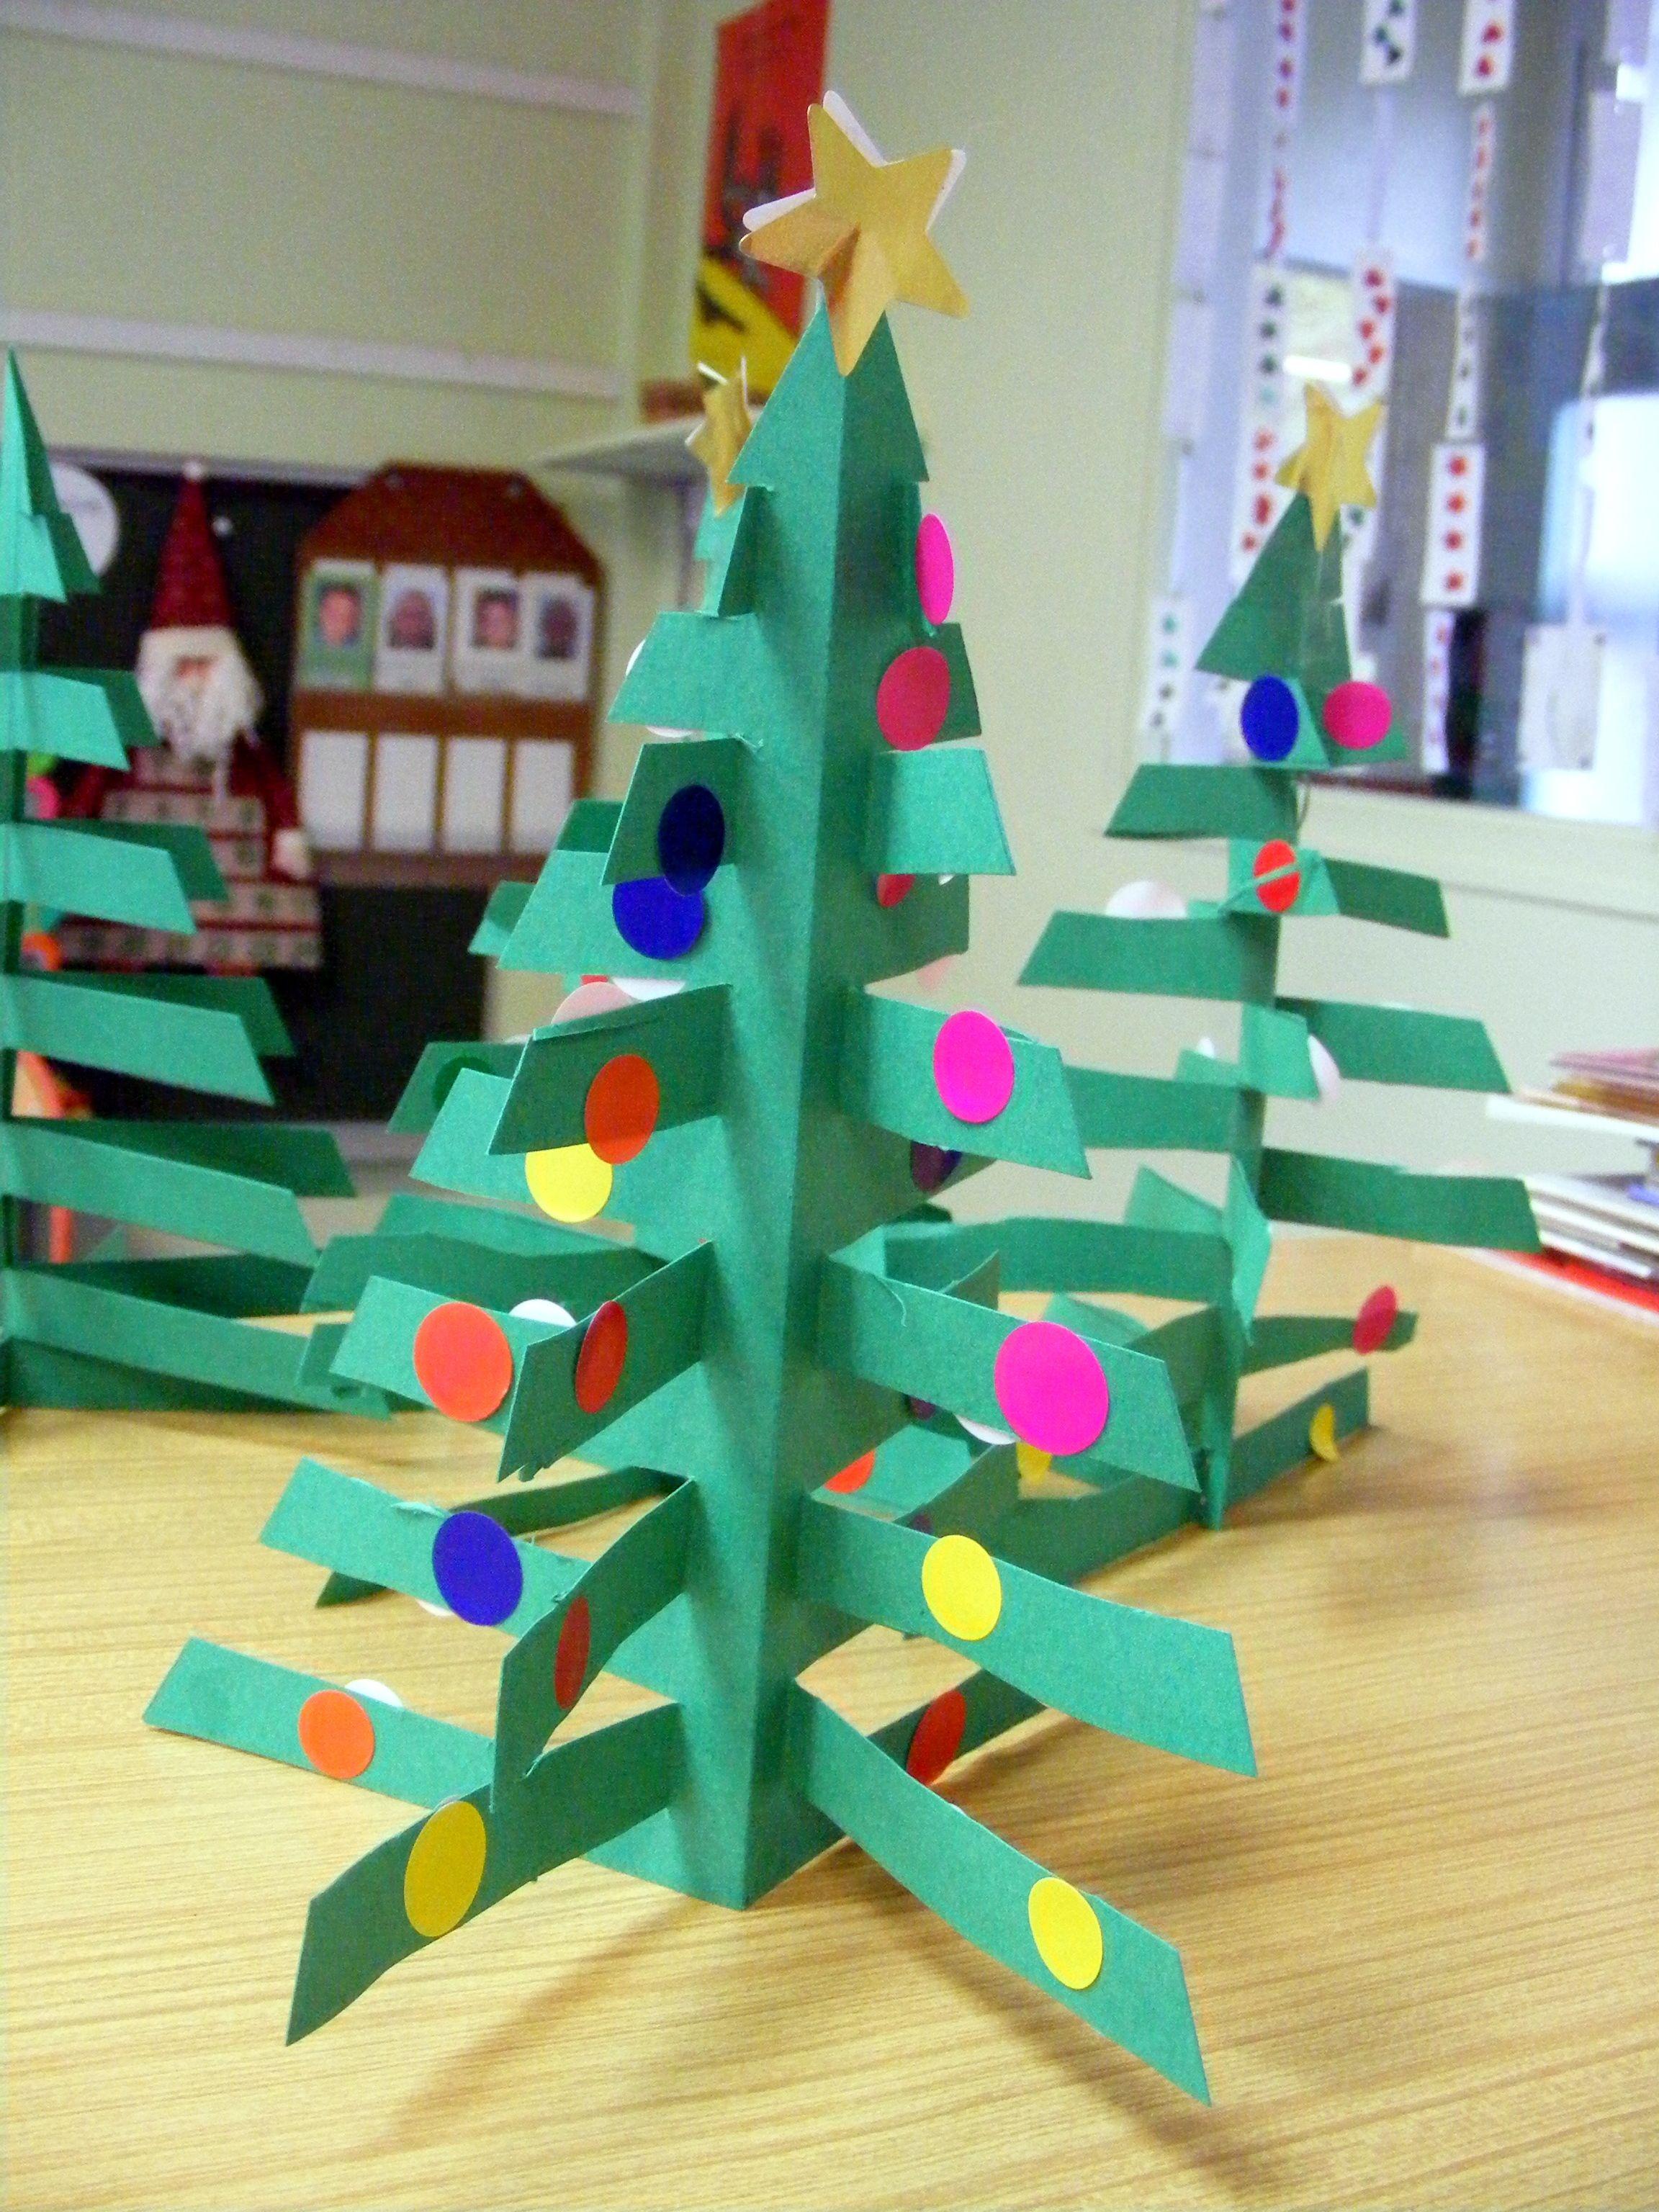 D tree craft idea navidad pinterest d tree tree crafts and